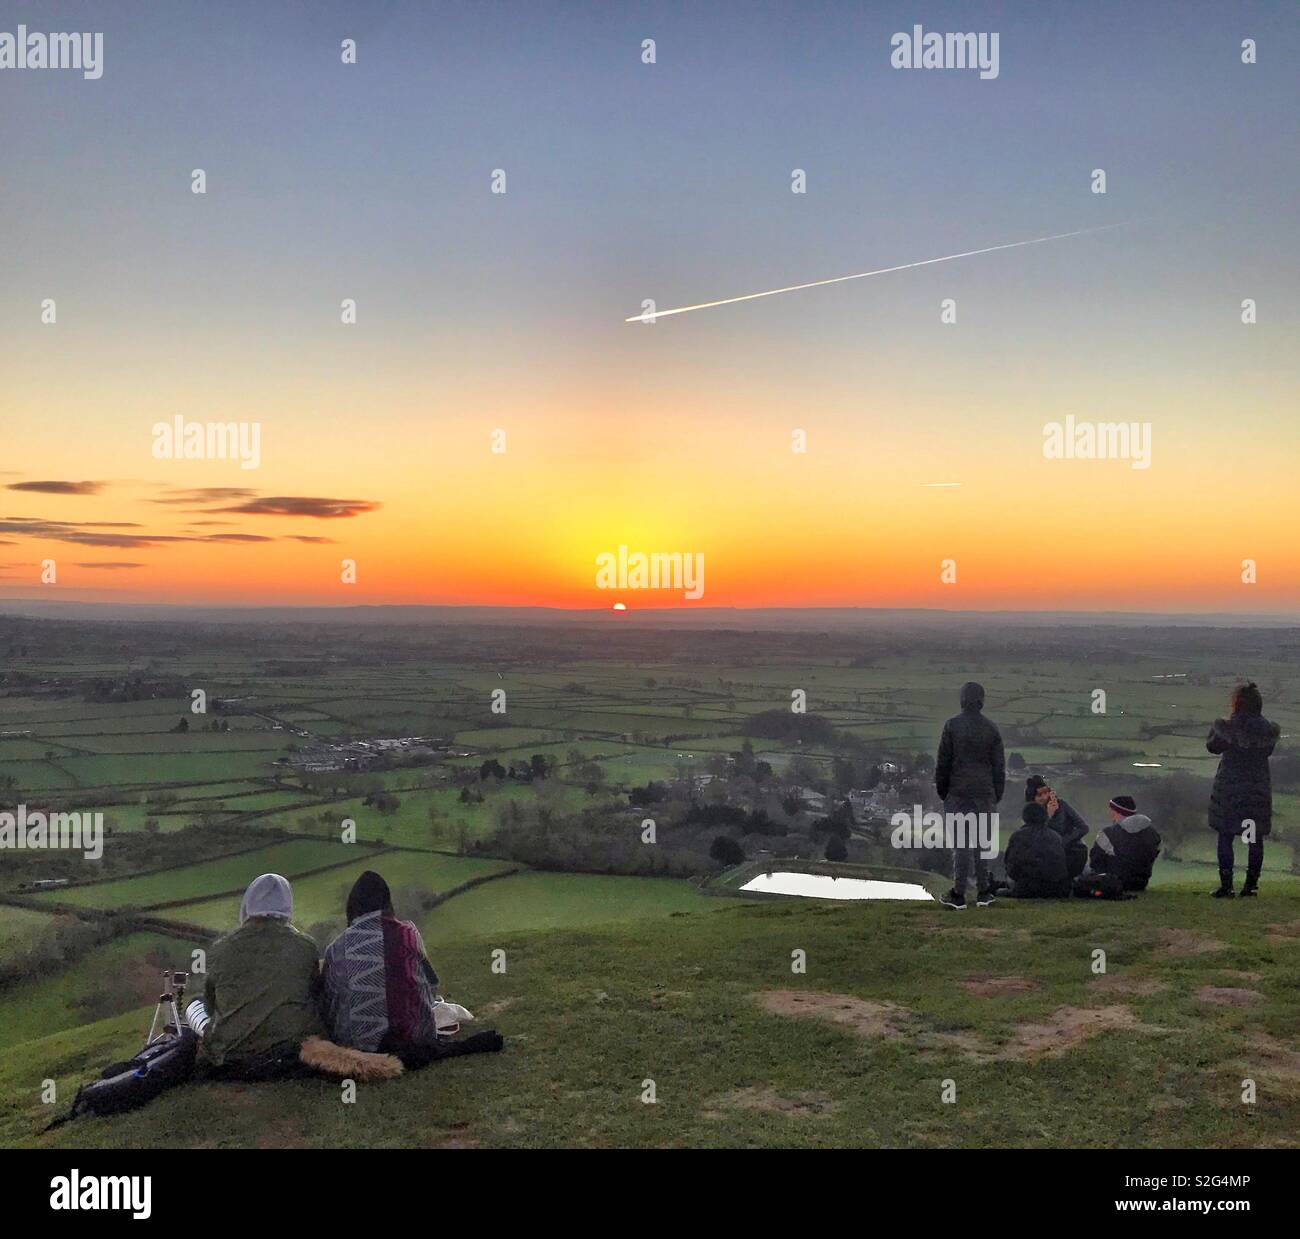 Daybreak on New Years Day 2019 at Glastonbury Tor, Somerset - Stock Image